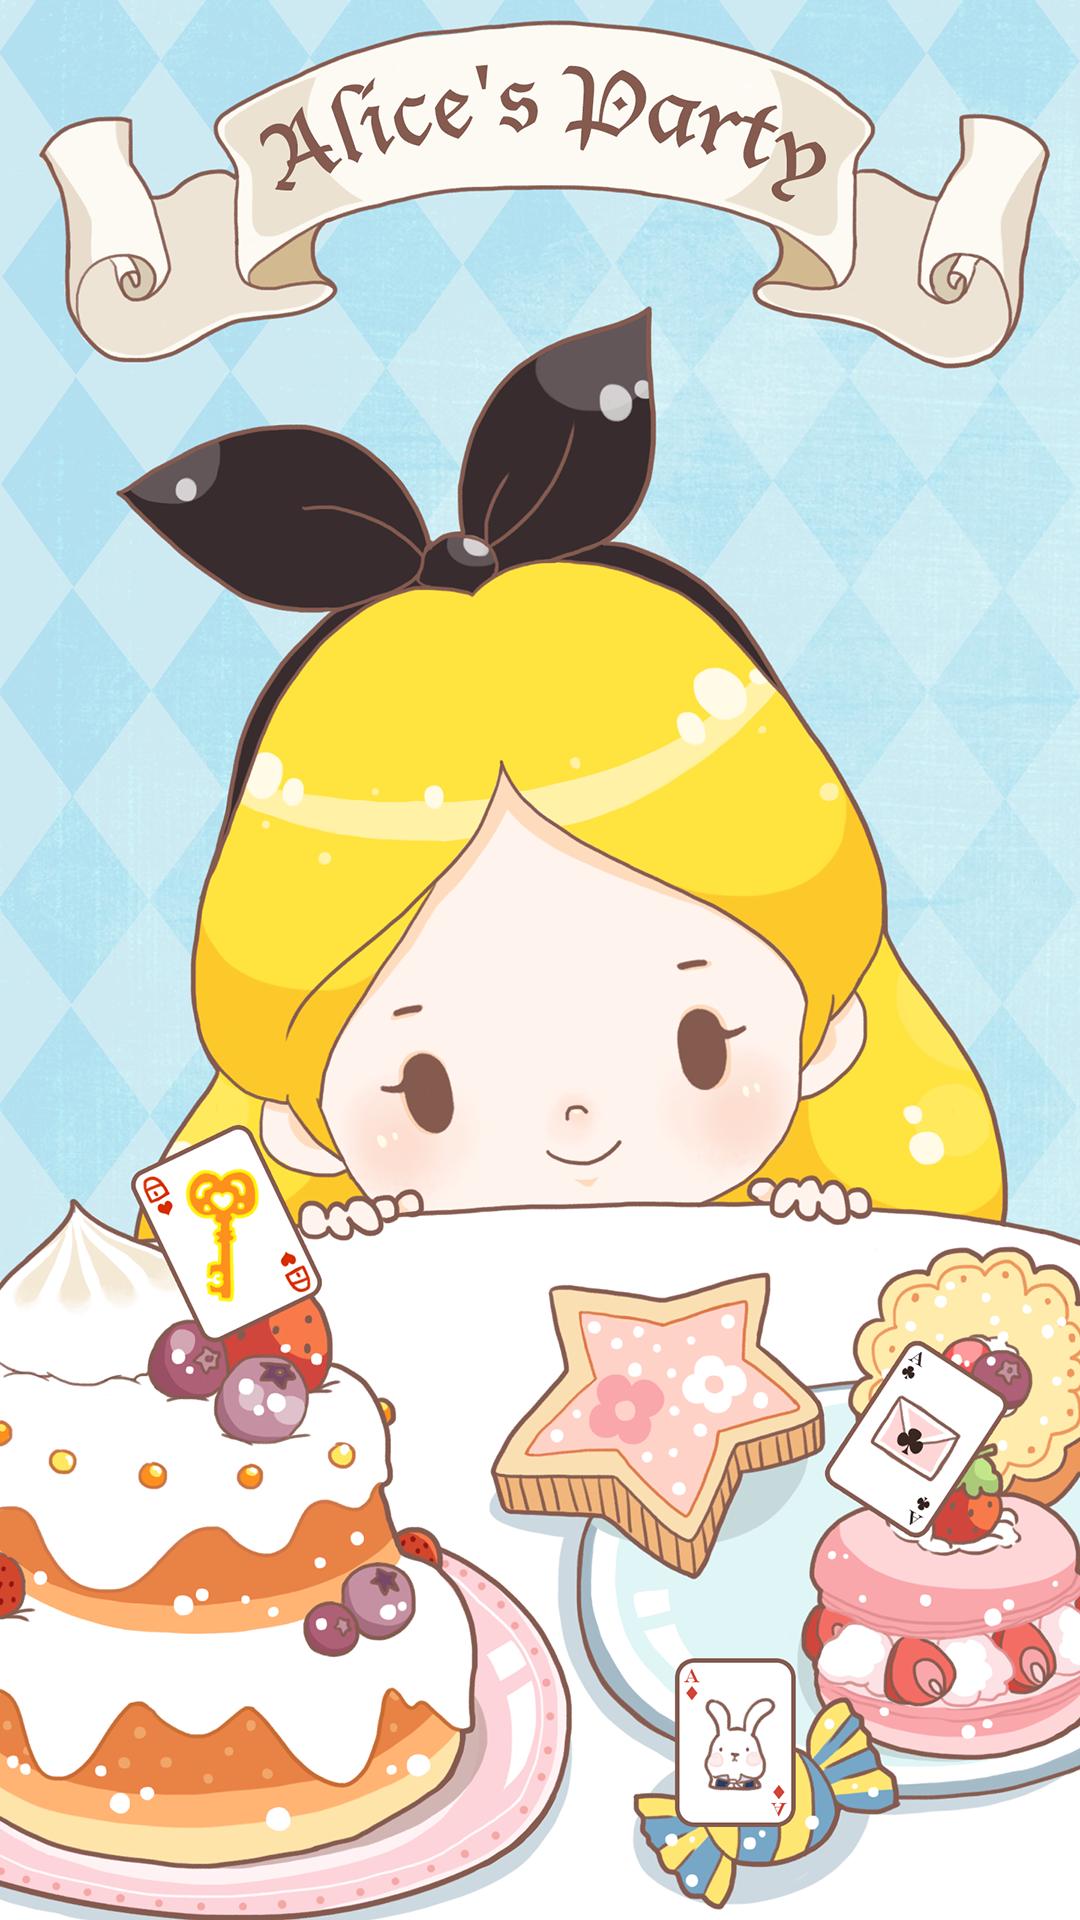 Alice In Wonderland Adventure Delicious Cakes And Candies